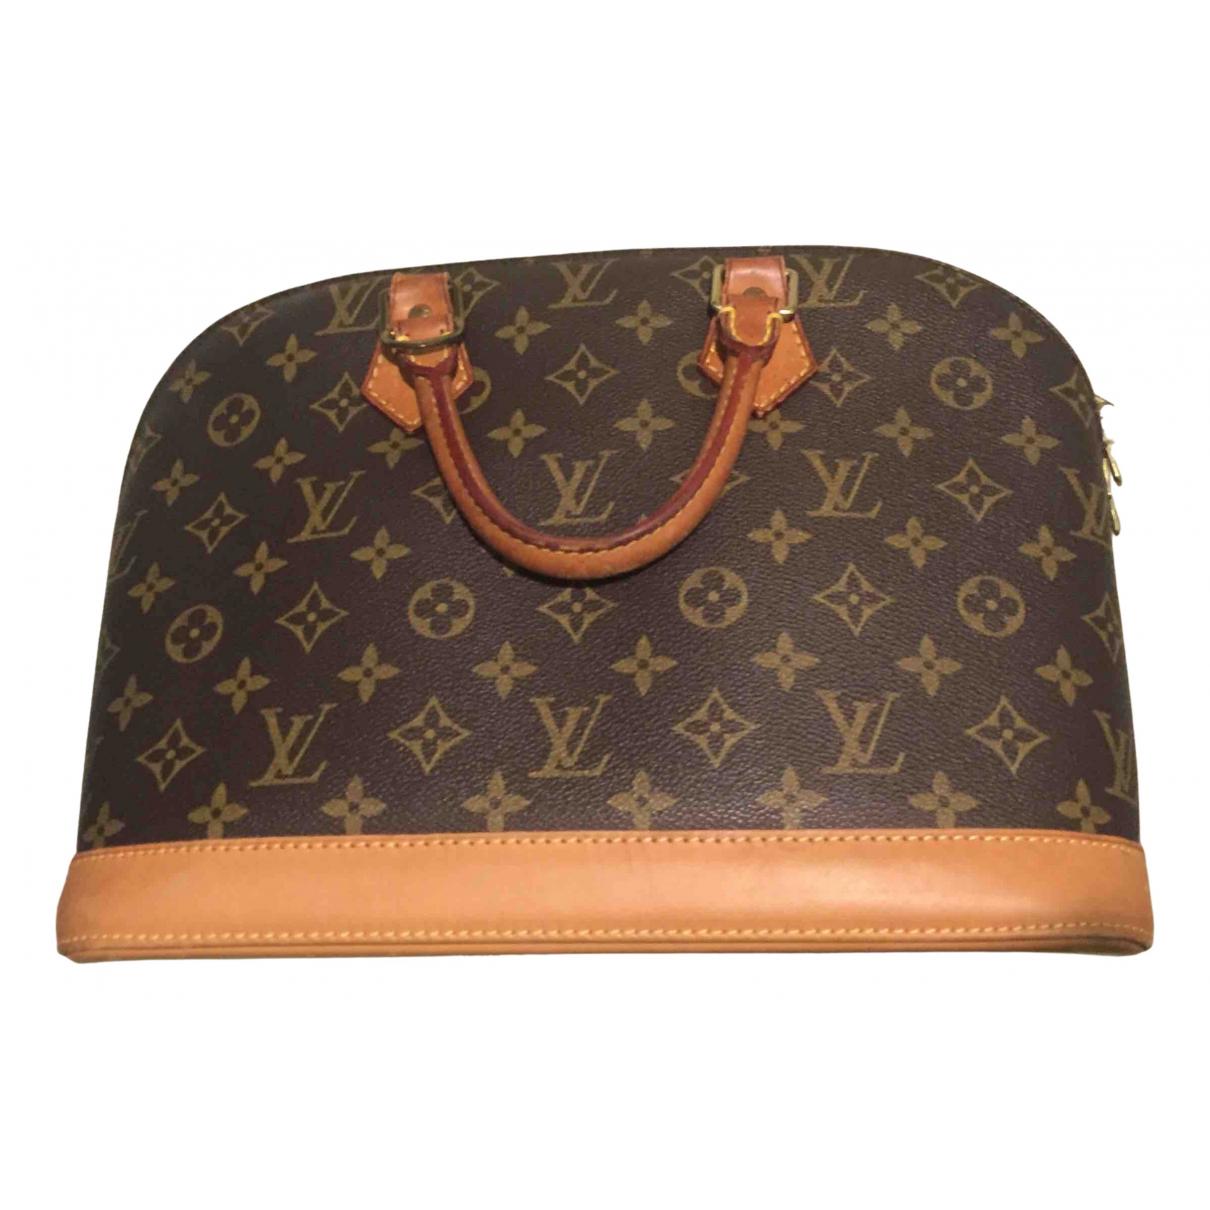 Louis Vuitton - Sac a main Alma pour femme en toile - marron